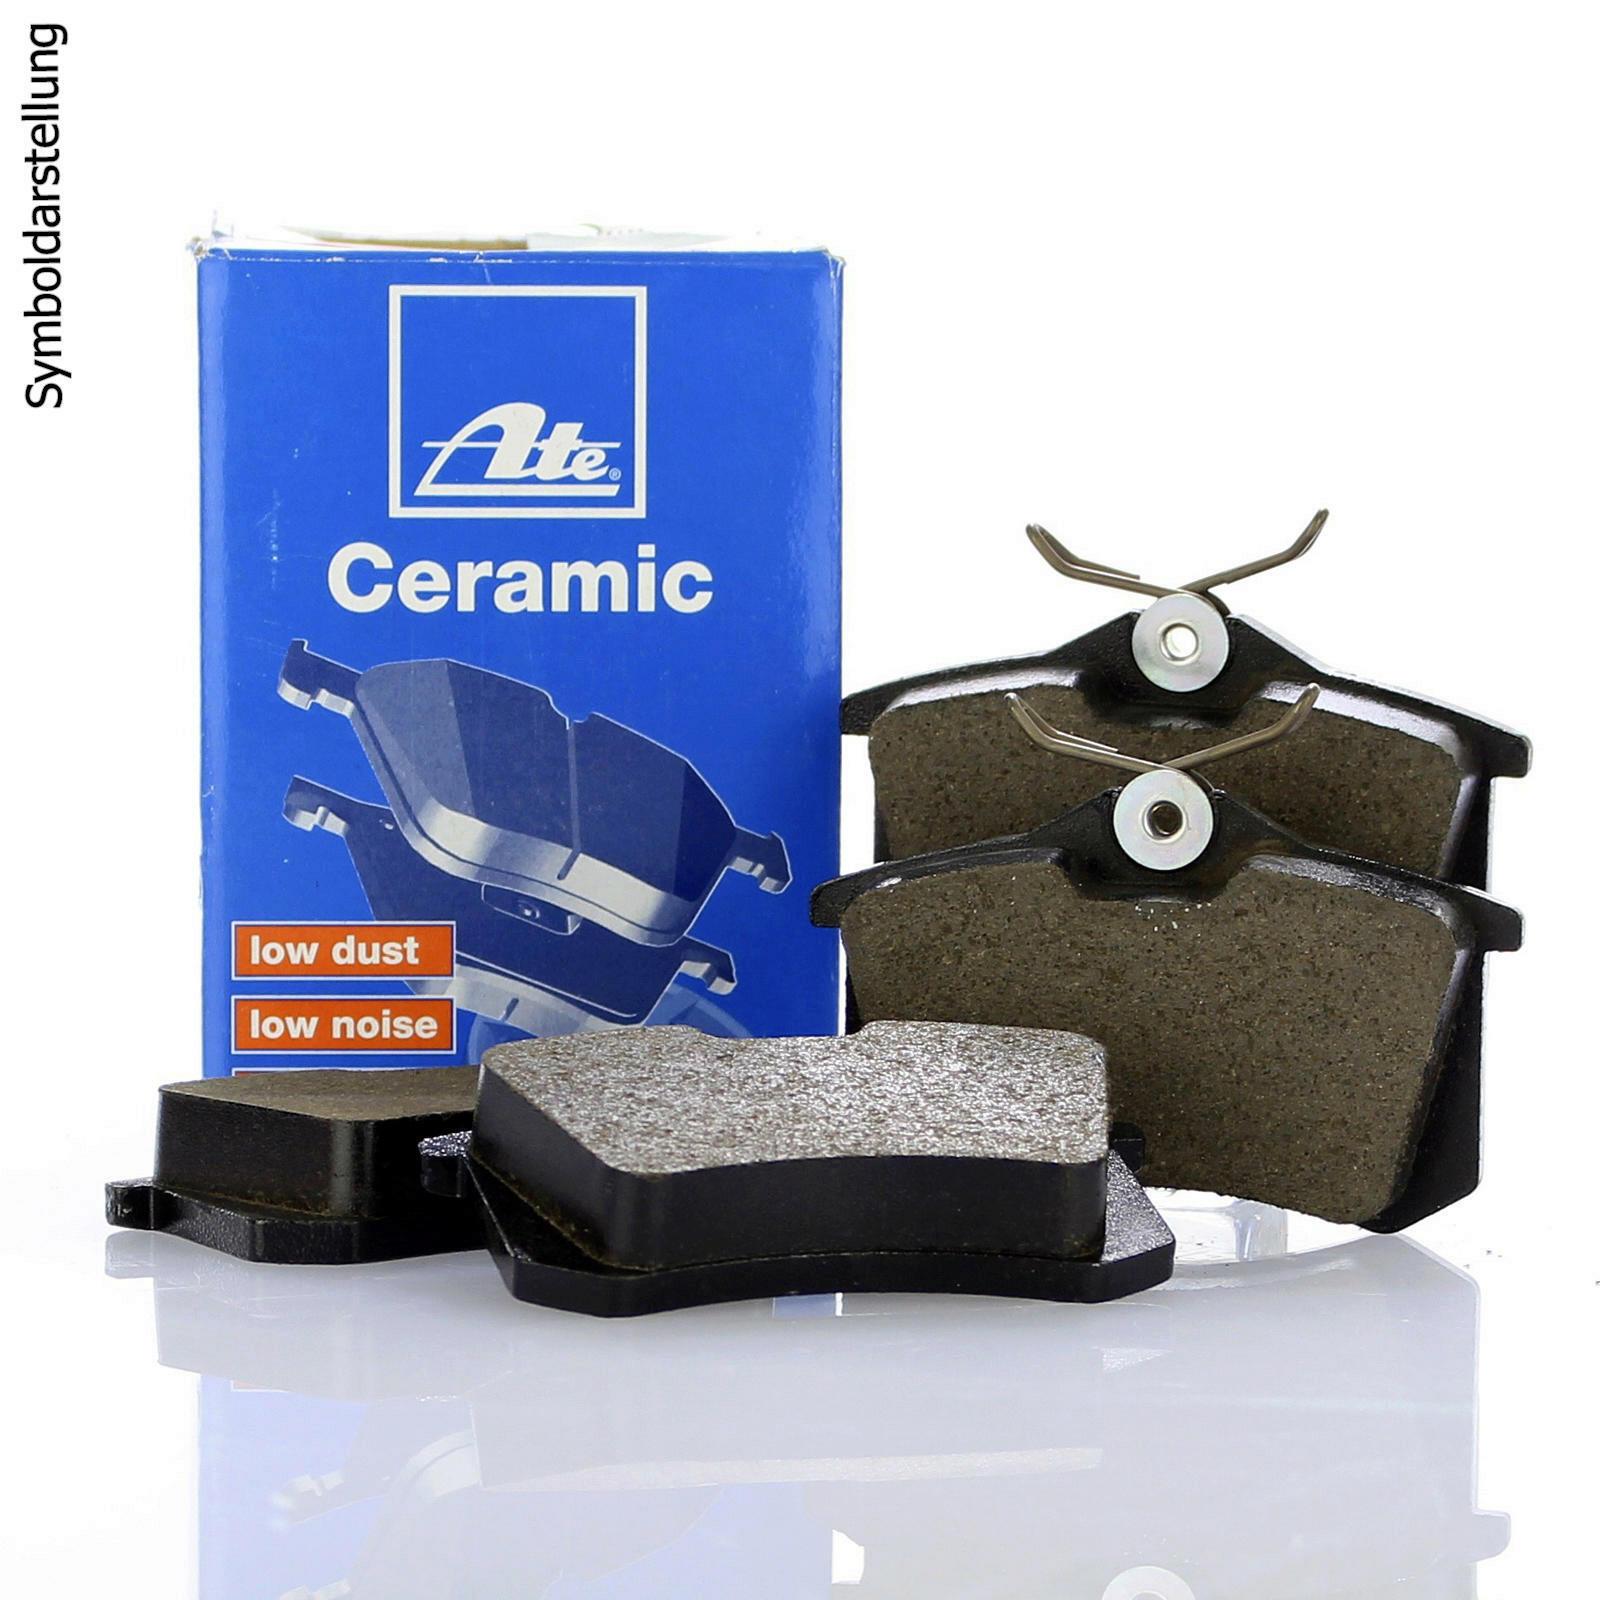 ATE CERAMIC BREMSBELÄGE HINTEN VOLVO S60 S80 XC70 2 V60 V70 3 XC60 D5+T3+2.0